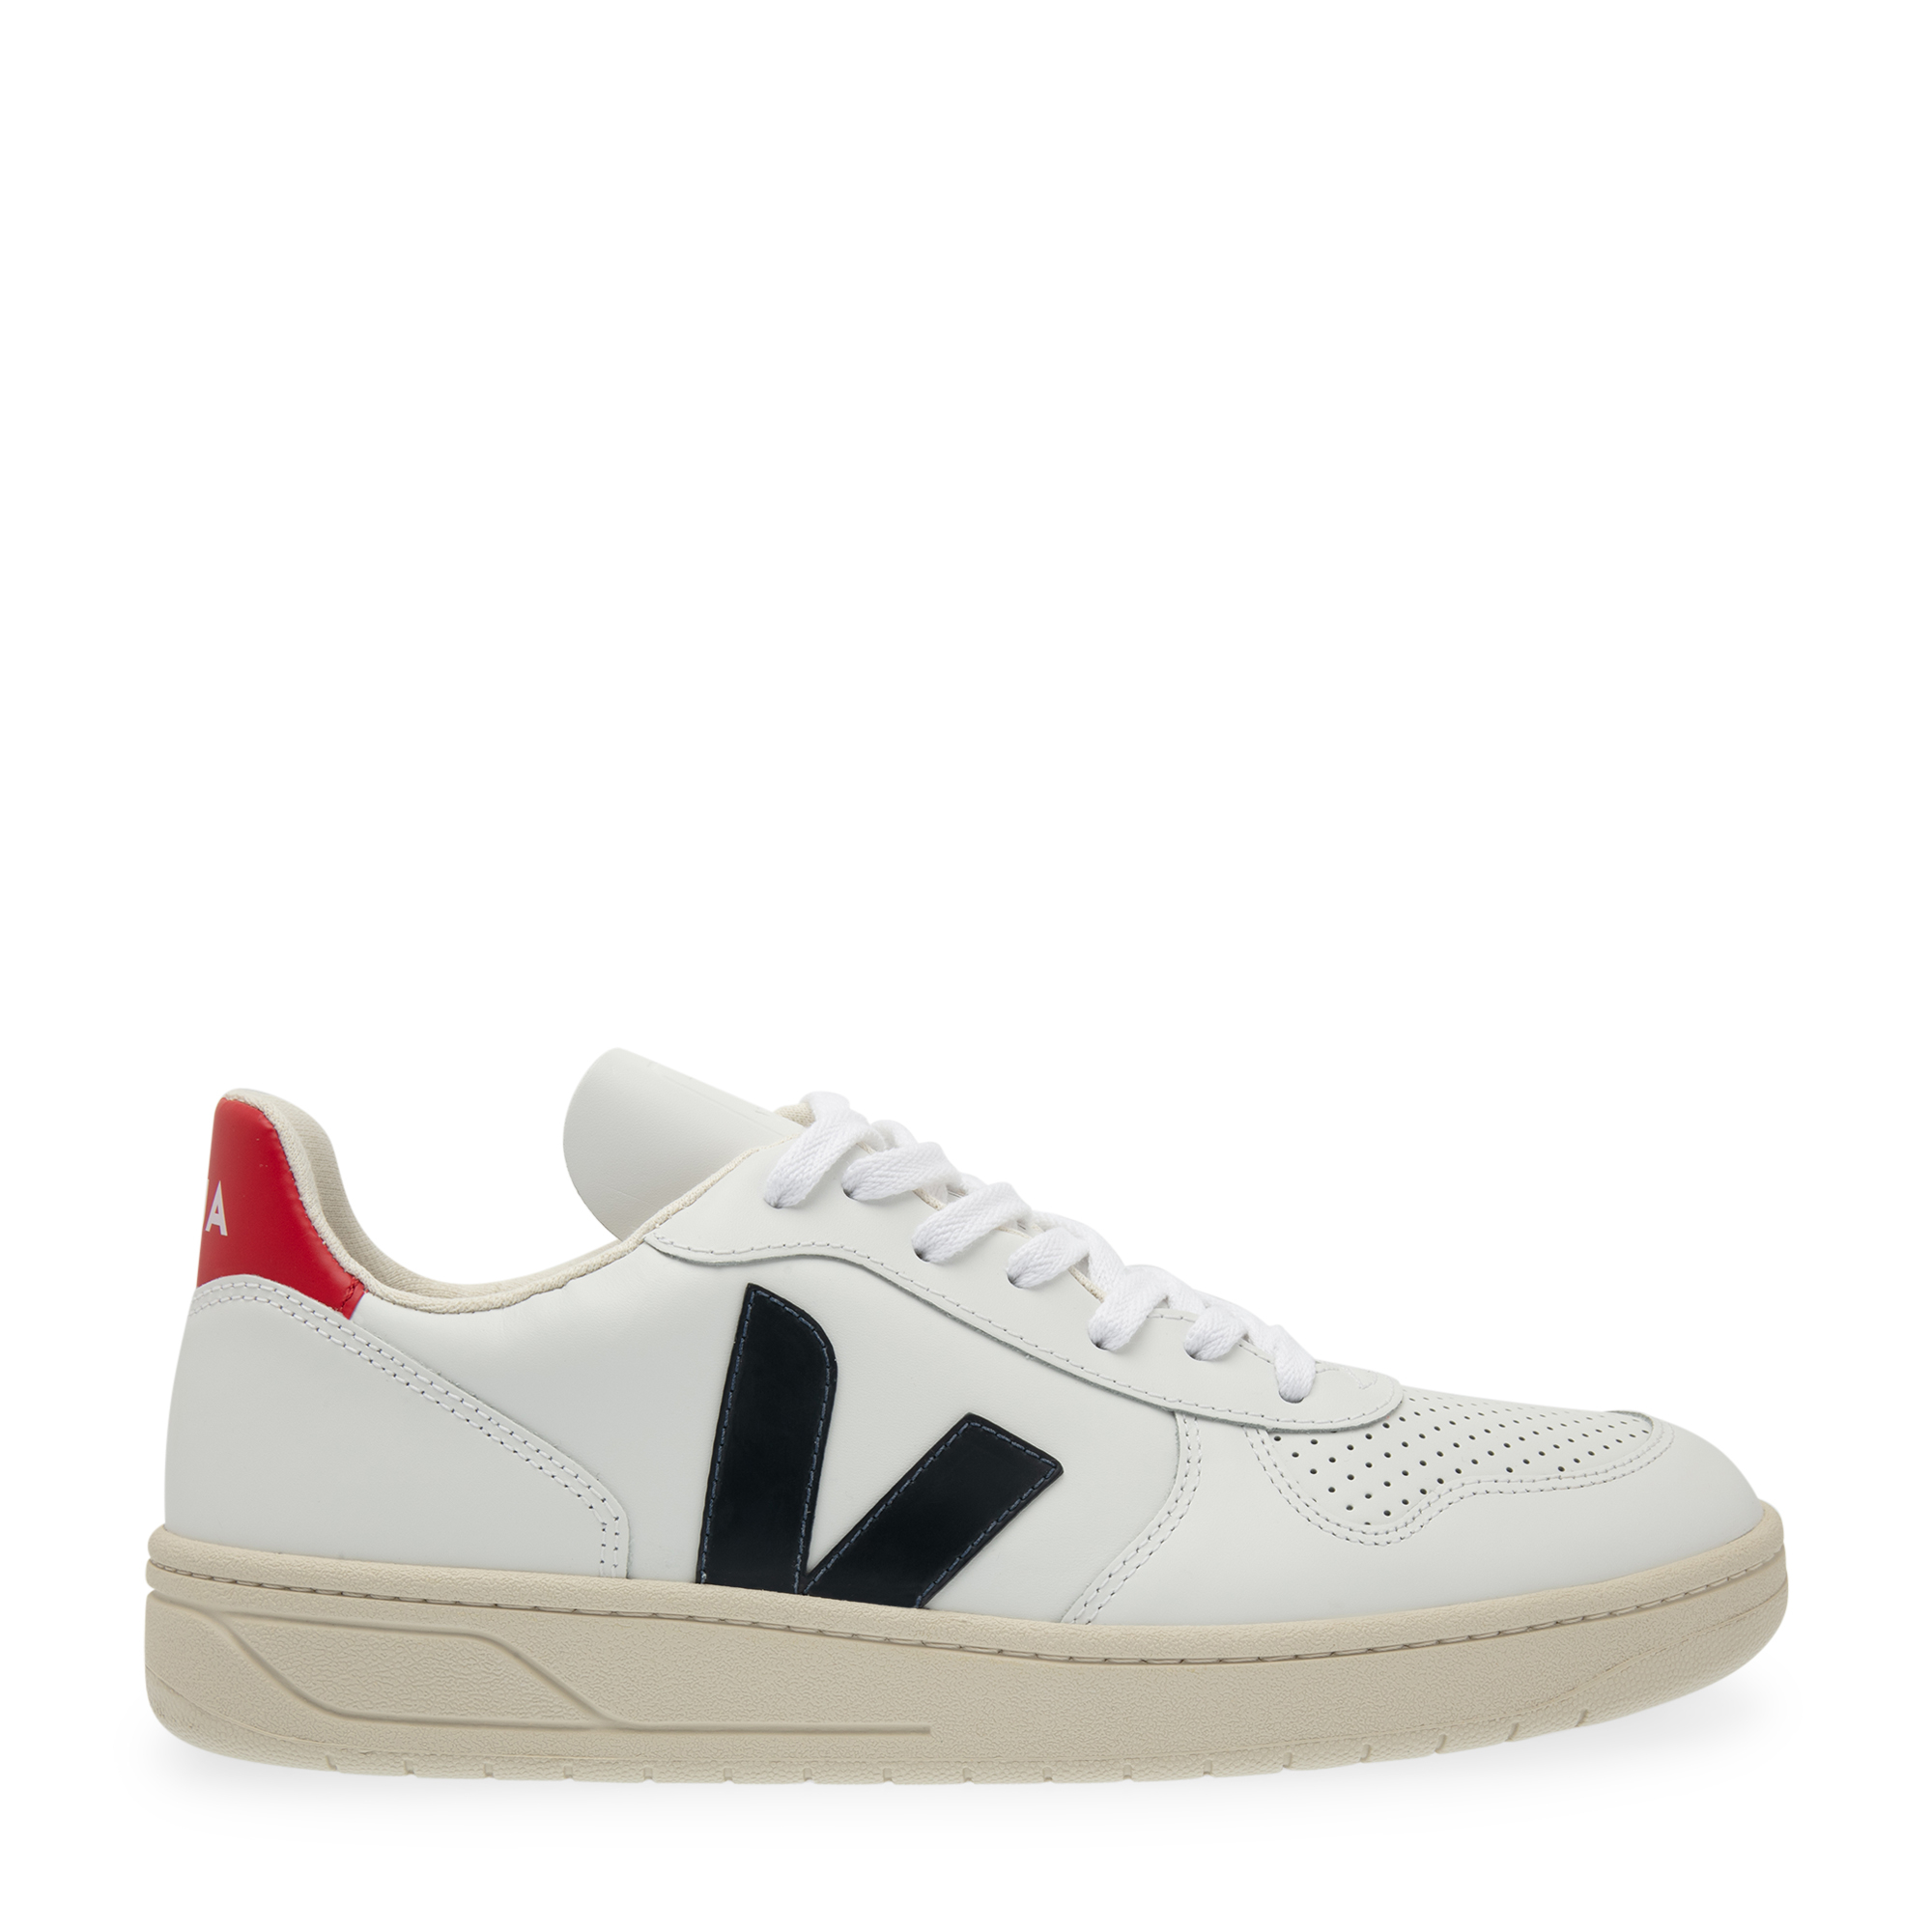 V-10 low top sneakers